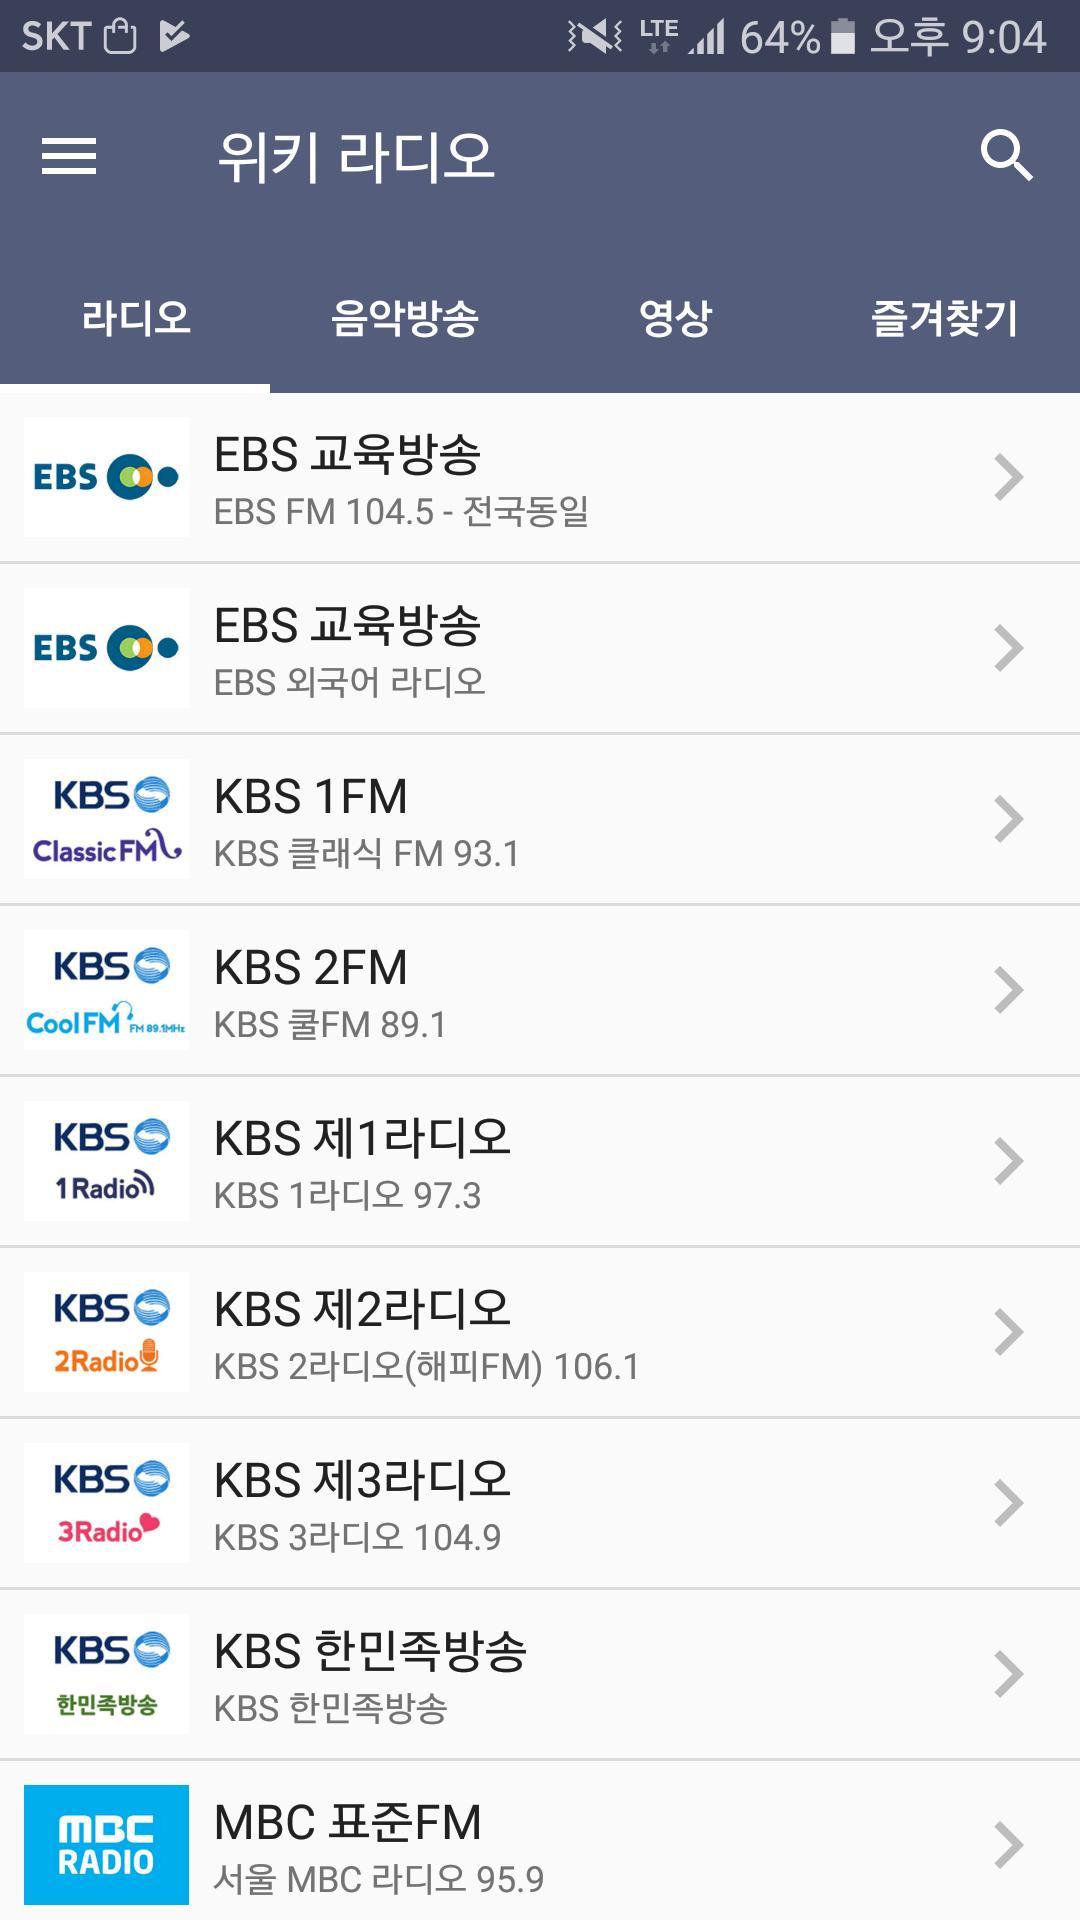 Wiki Radio - Korea FM Radio & Kpop for Android - APK Download